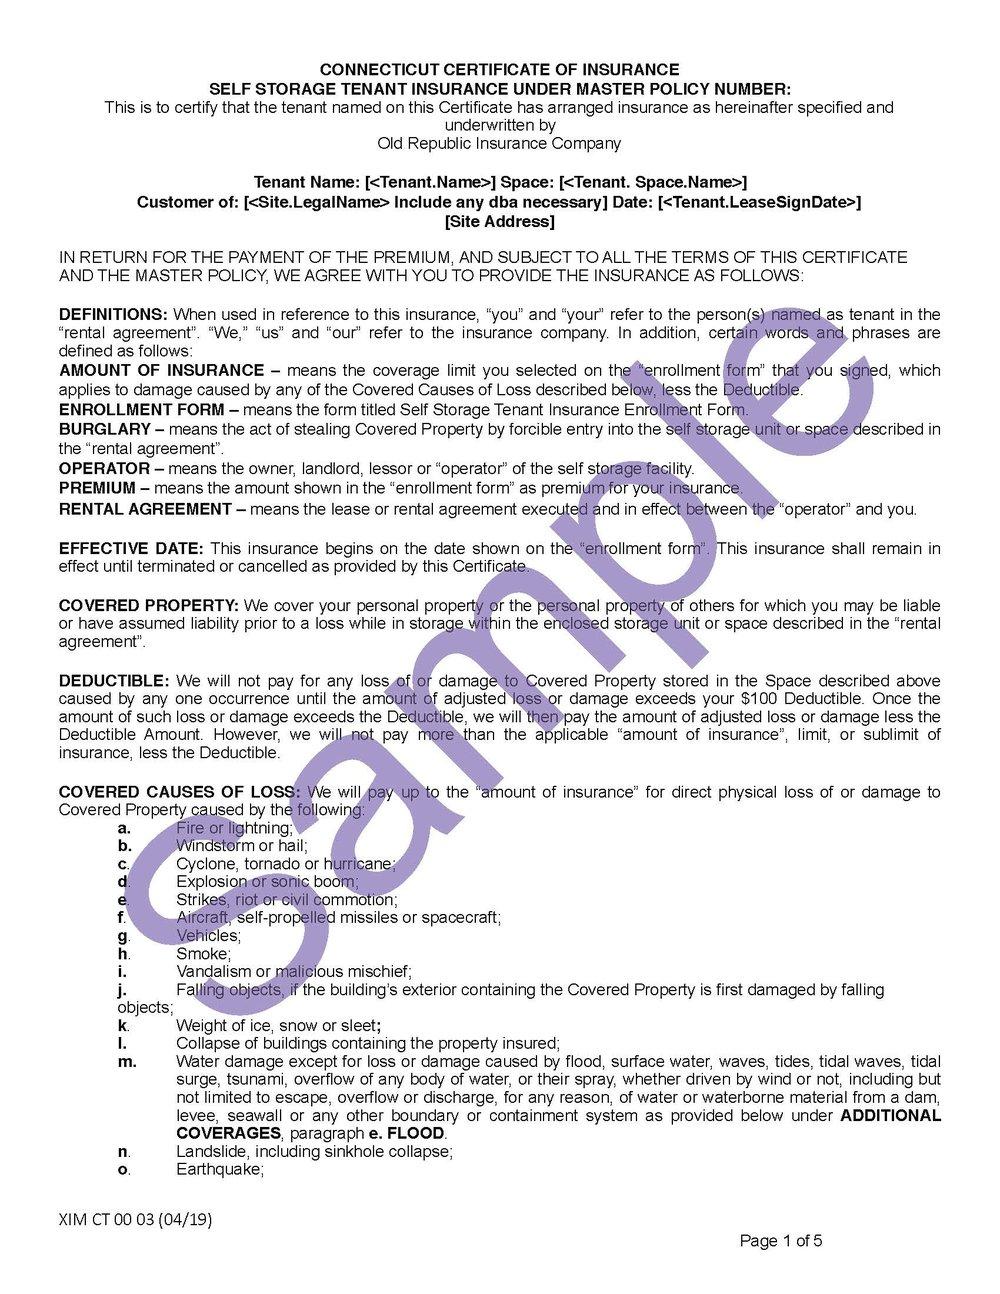 XIM CT 00 03 04 19 Connecticut Certificate of InsuranceSample_Page_1.jpg